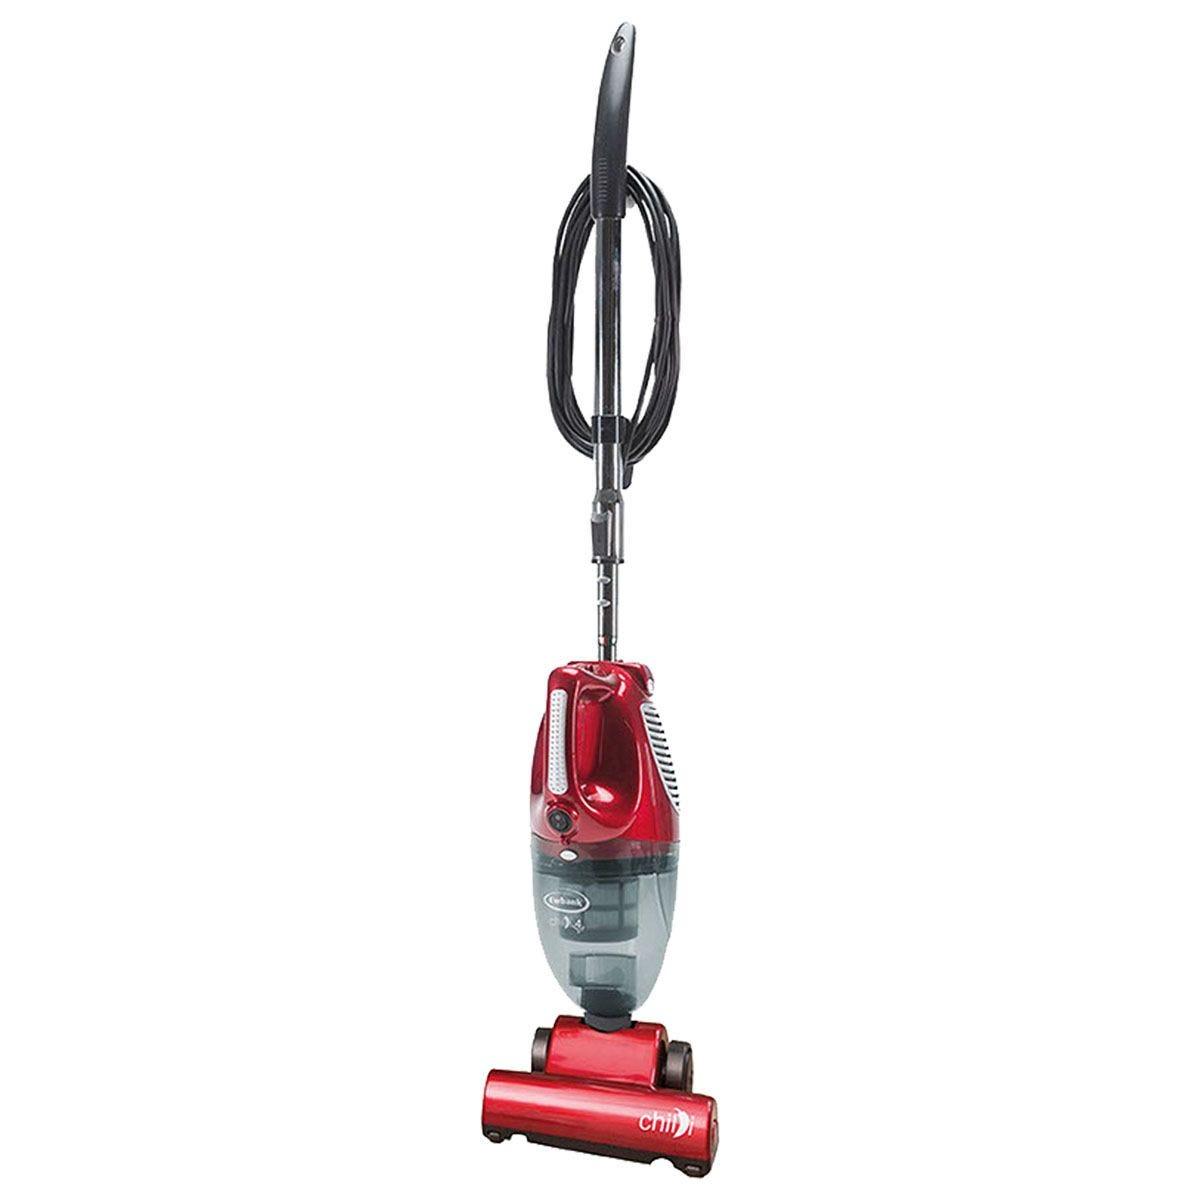 Ewbank Chilli 4 EW0004 2–in–1 Lightweight Corded Vacuum Cleaner – Red